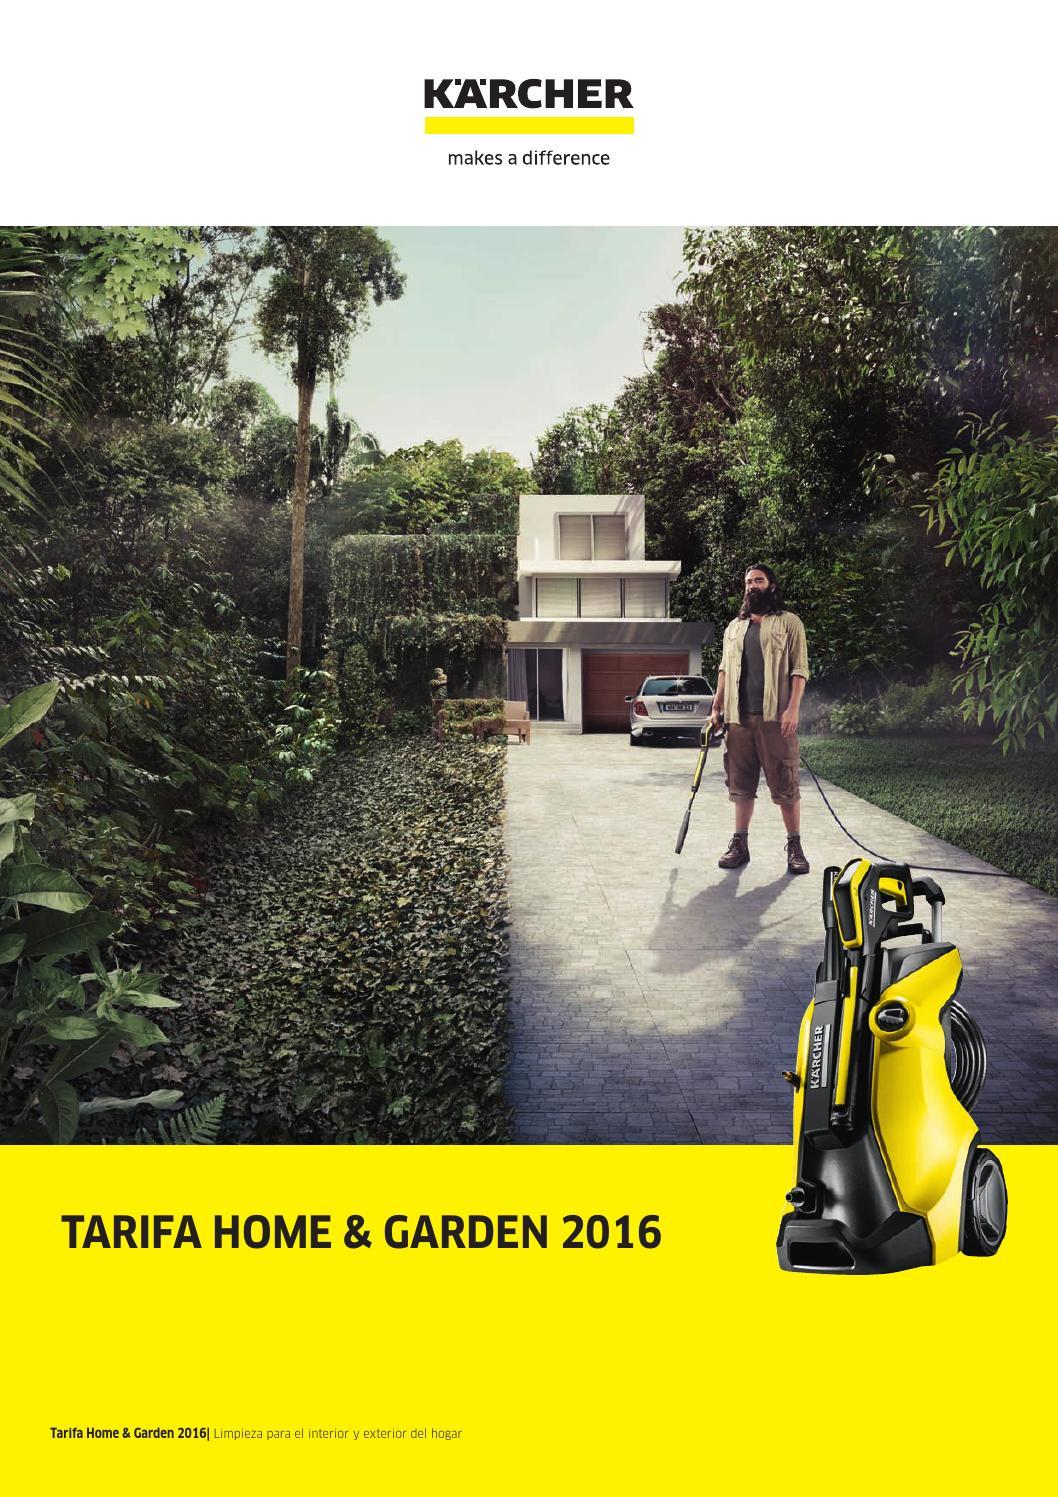 2 Karcher Tarifa Home Garden 2016 By Maquiauto Issuu